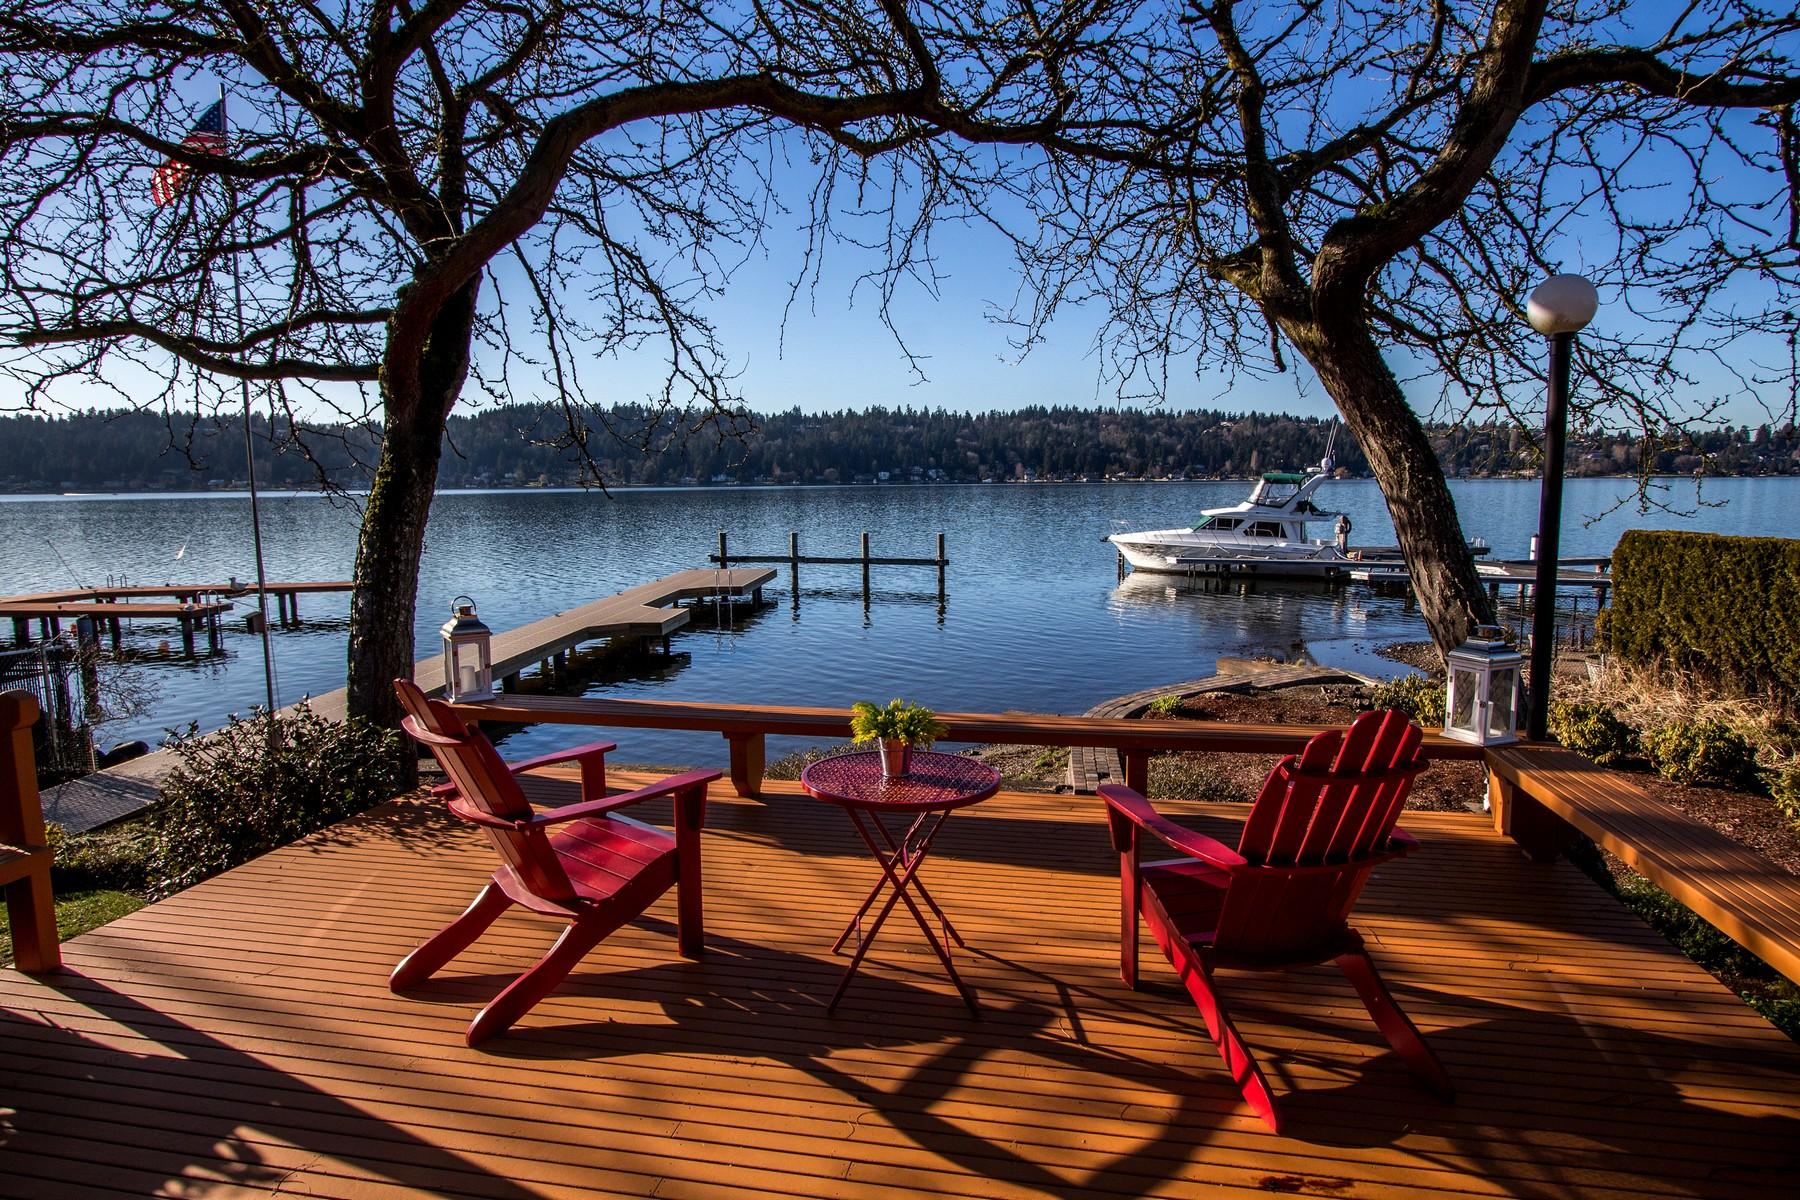 Single Family Home for Sale at Lakehurst Lane Waterfront 4737 Lakehurst Lane Bellevue, Washington 98006 United States